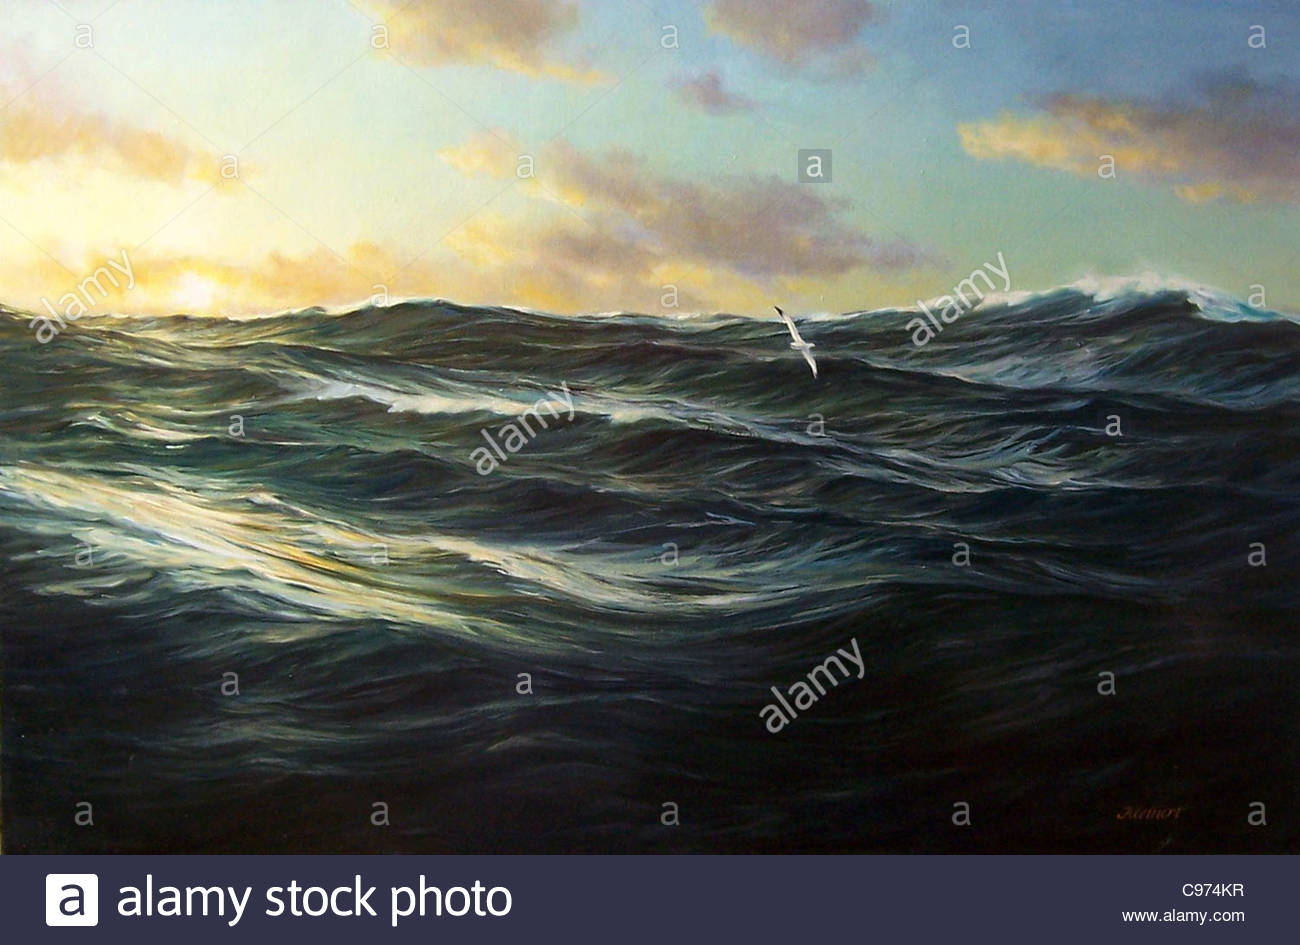 Albatross Atlantic - Stock Image